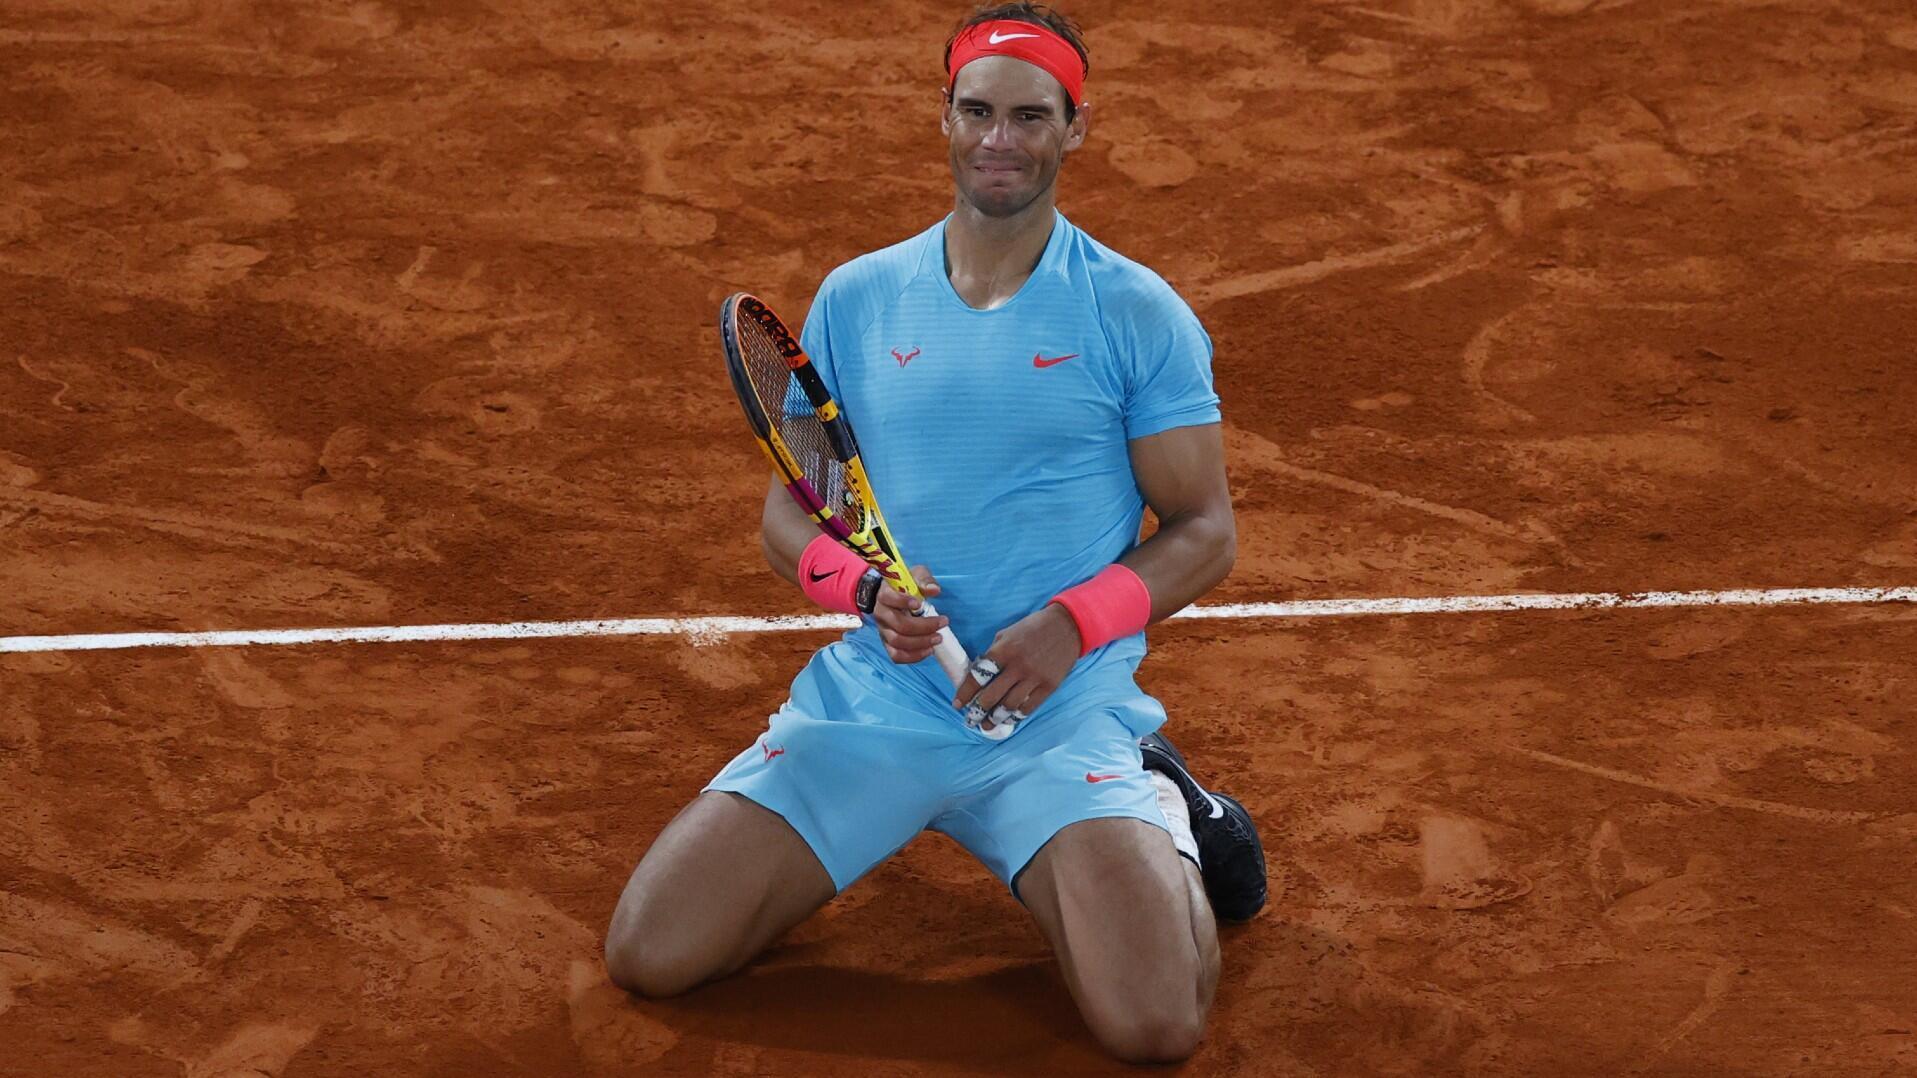 Roland-GArros Tennis déconfinent